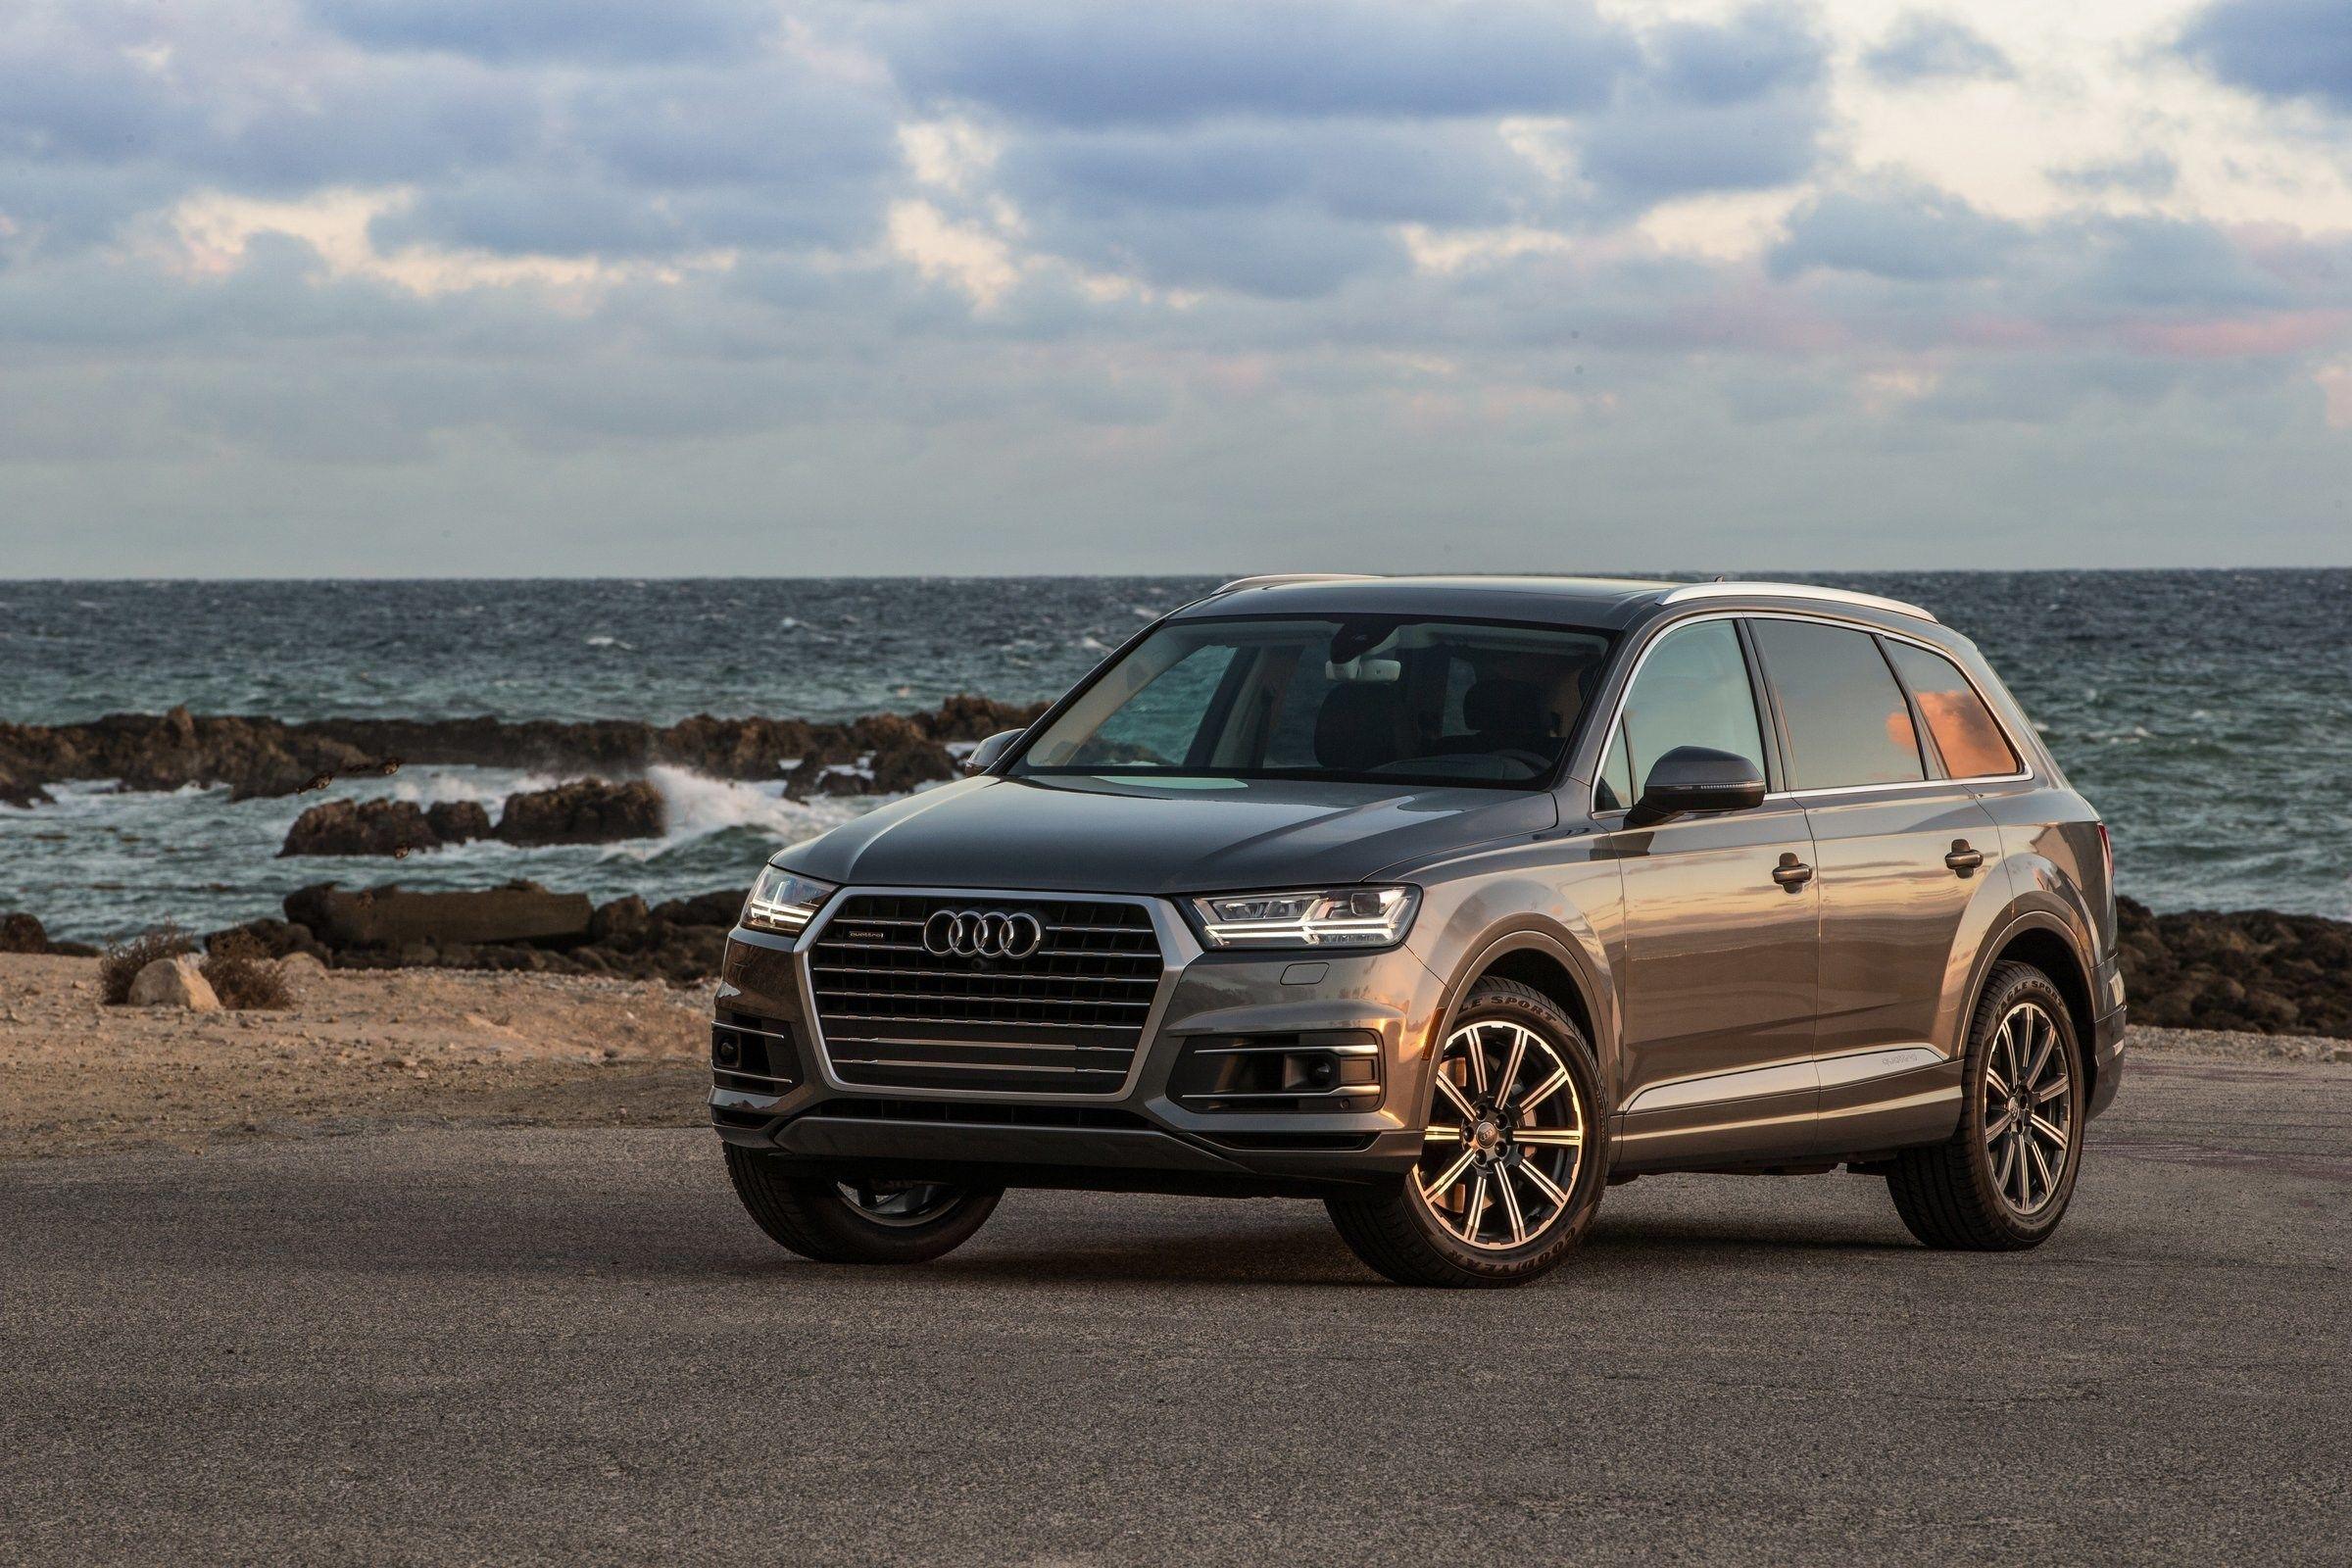 Audi audi q7 wallpaper